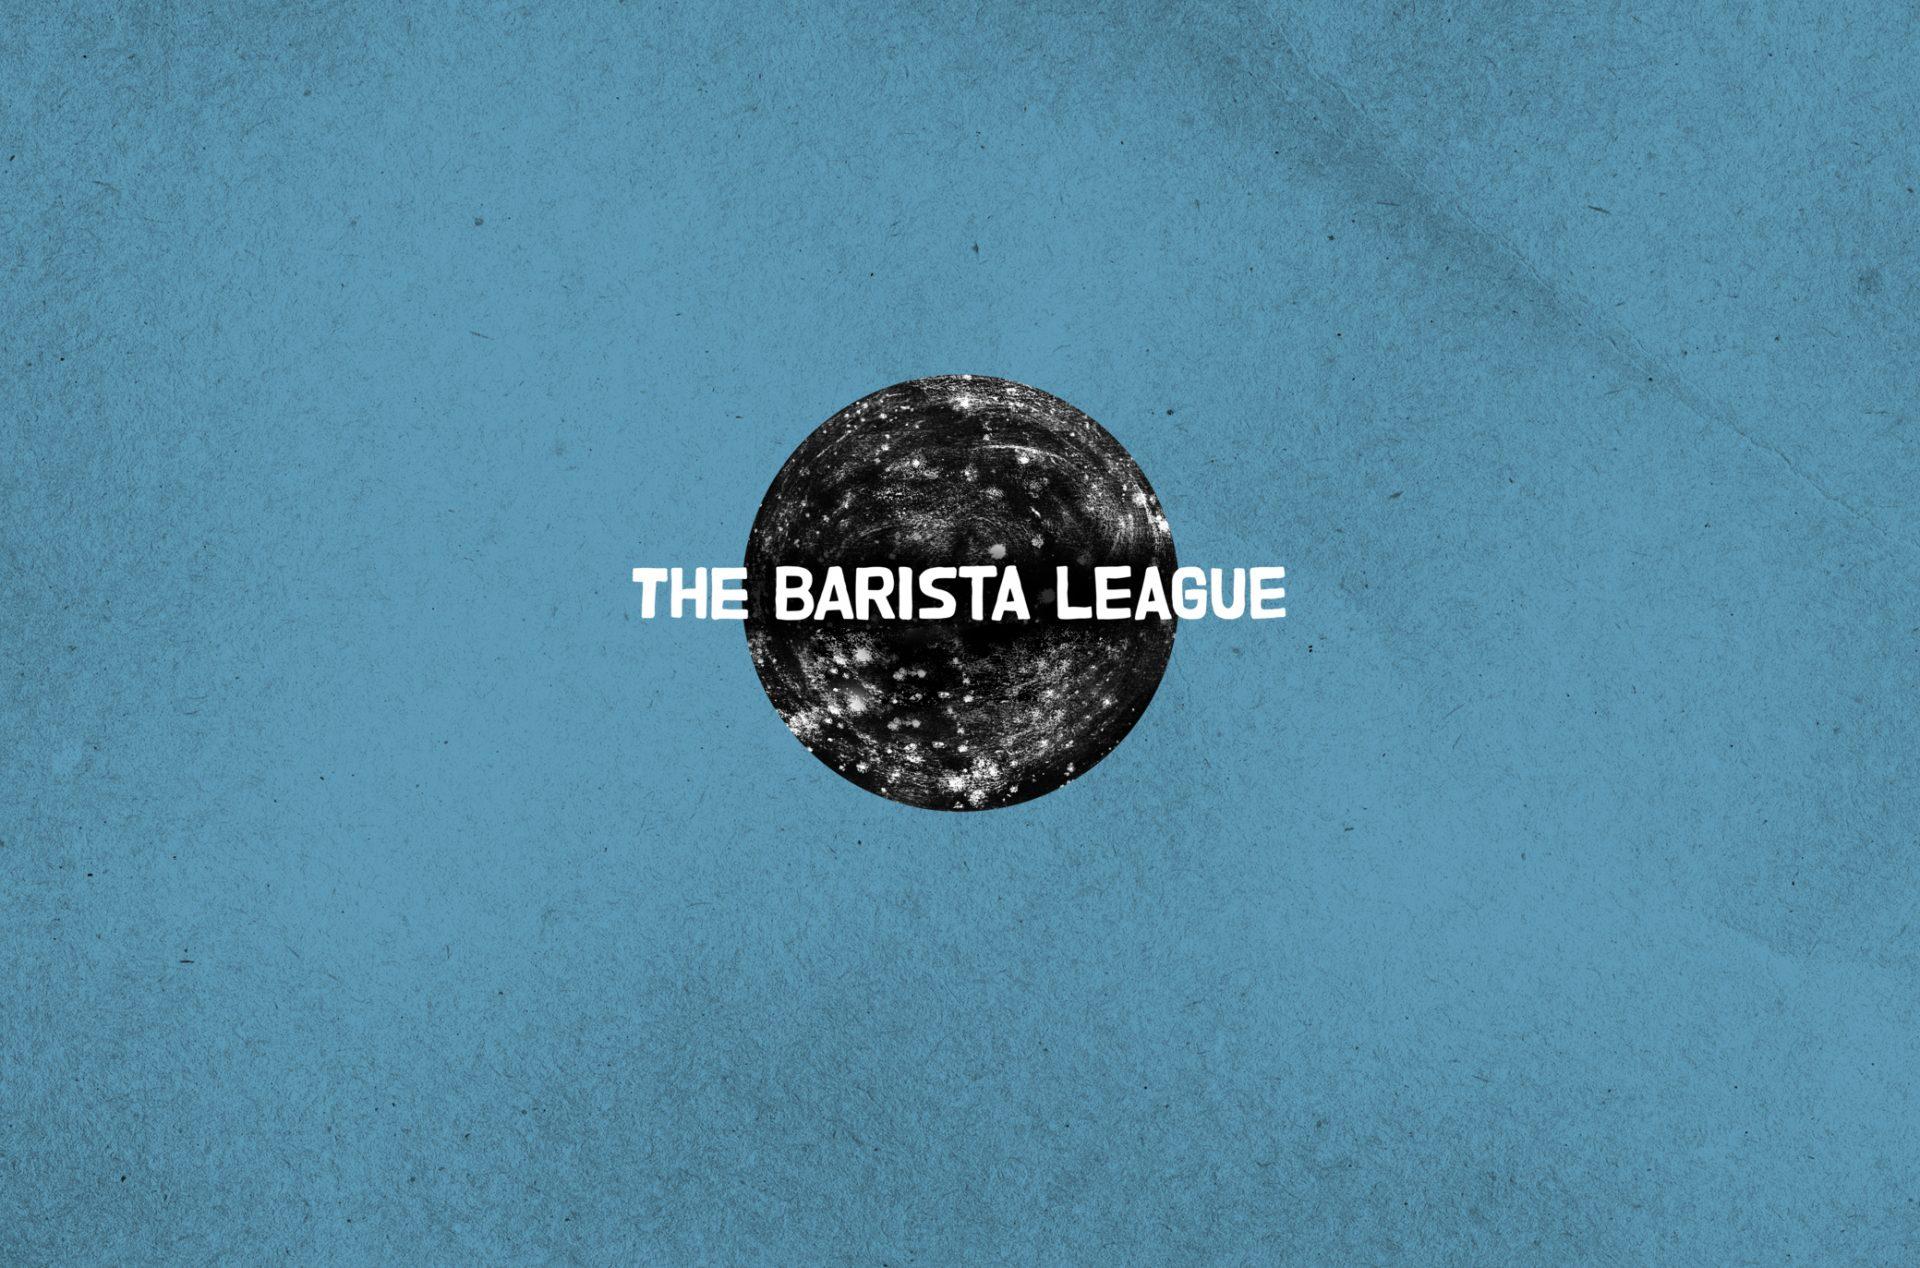 RS1 flies to Copenhagen for the Barista League